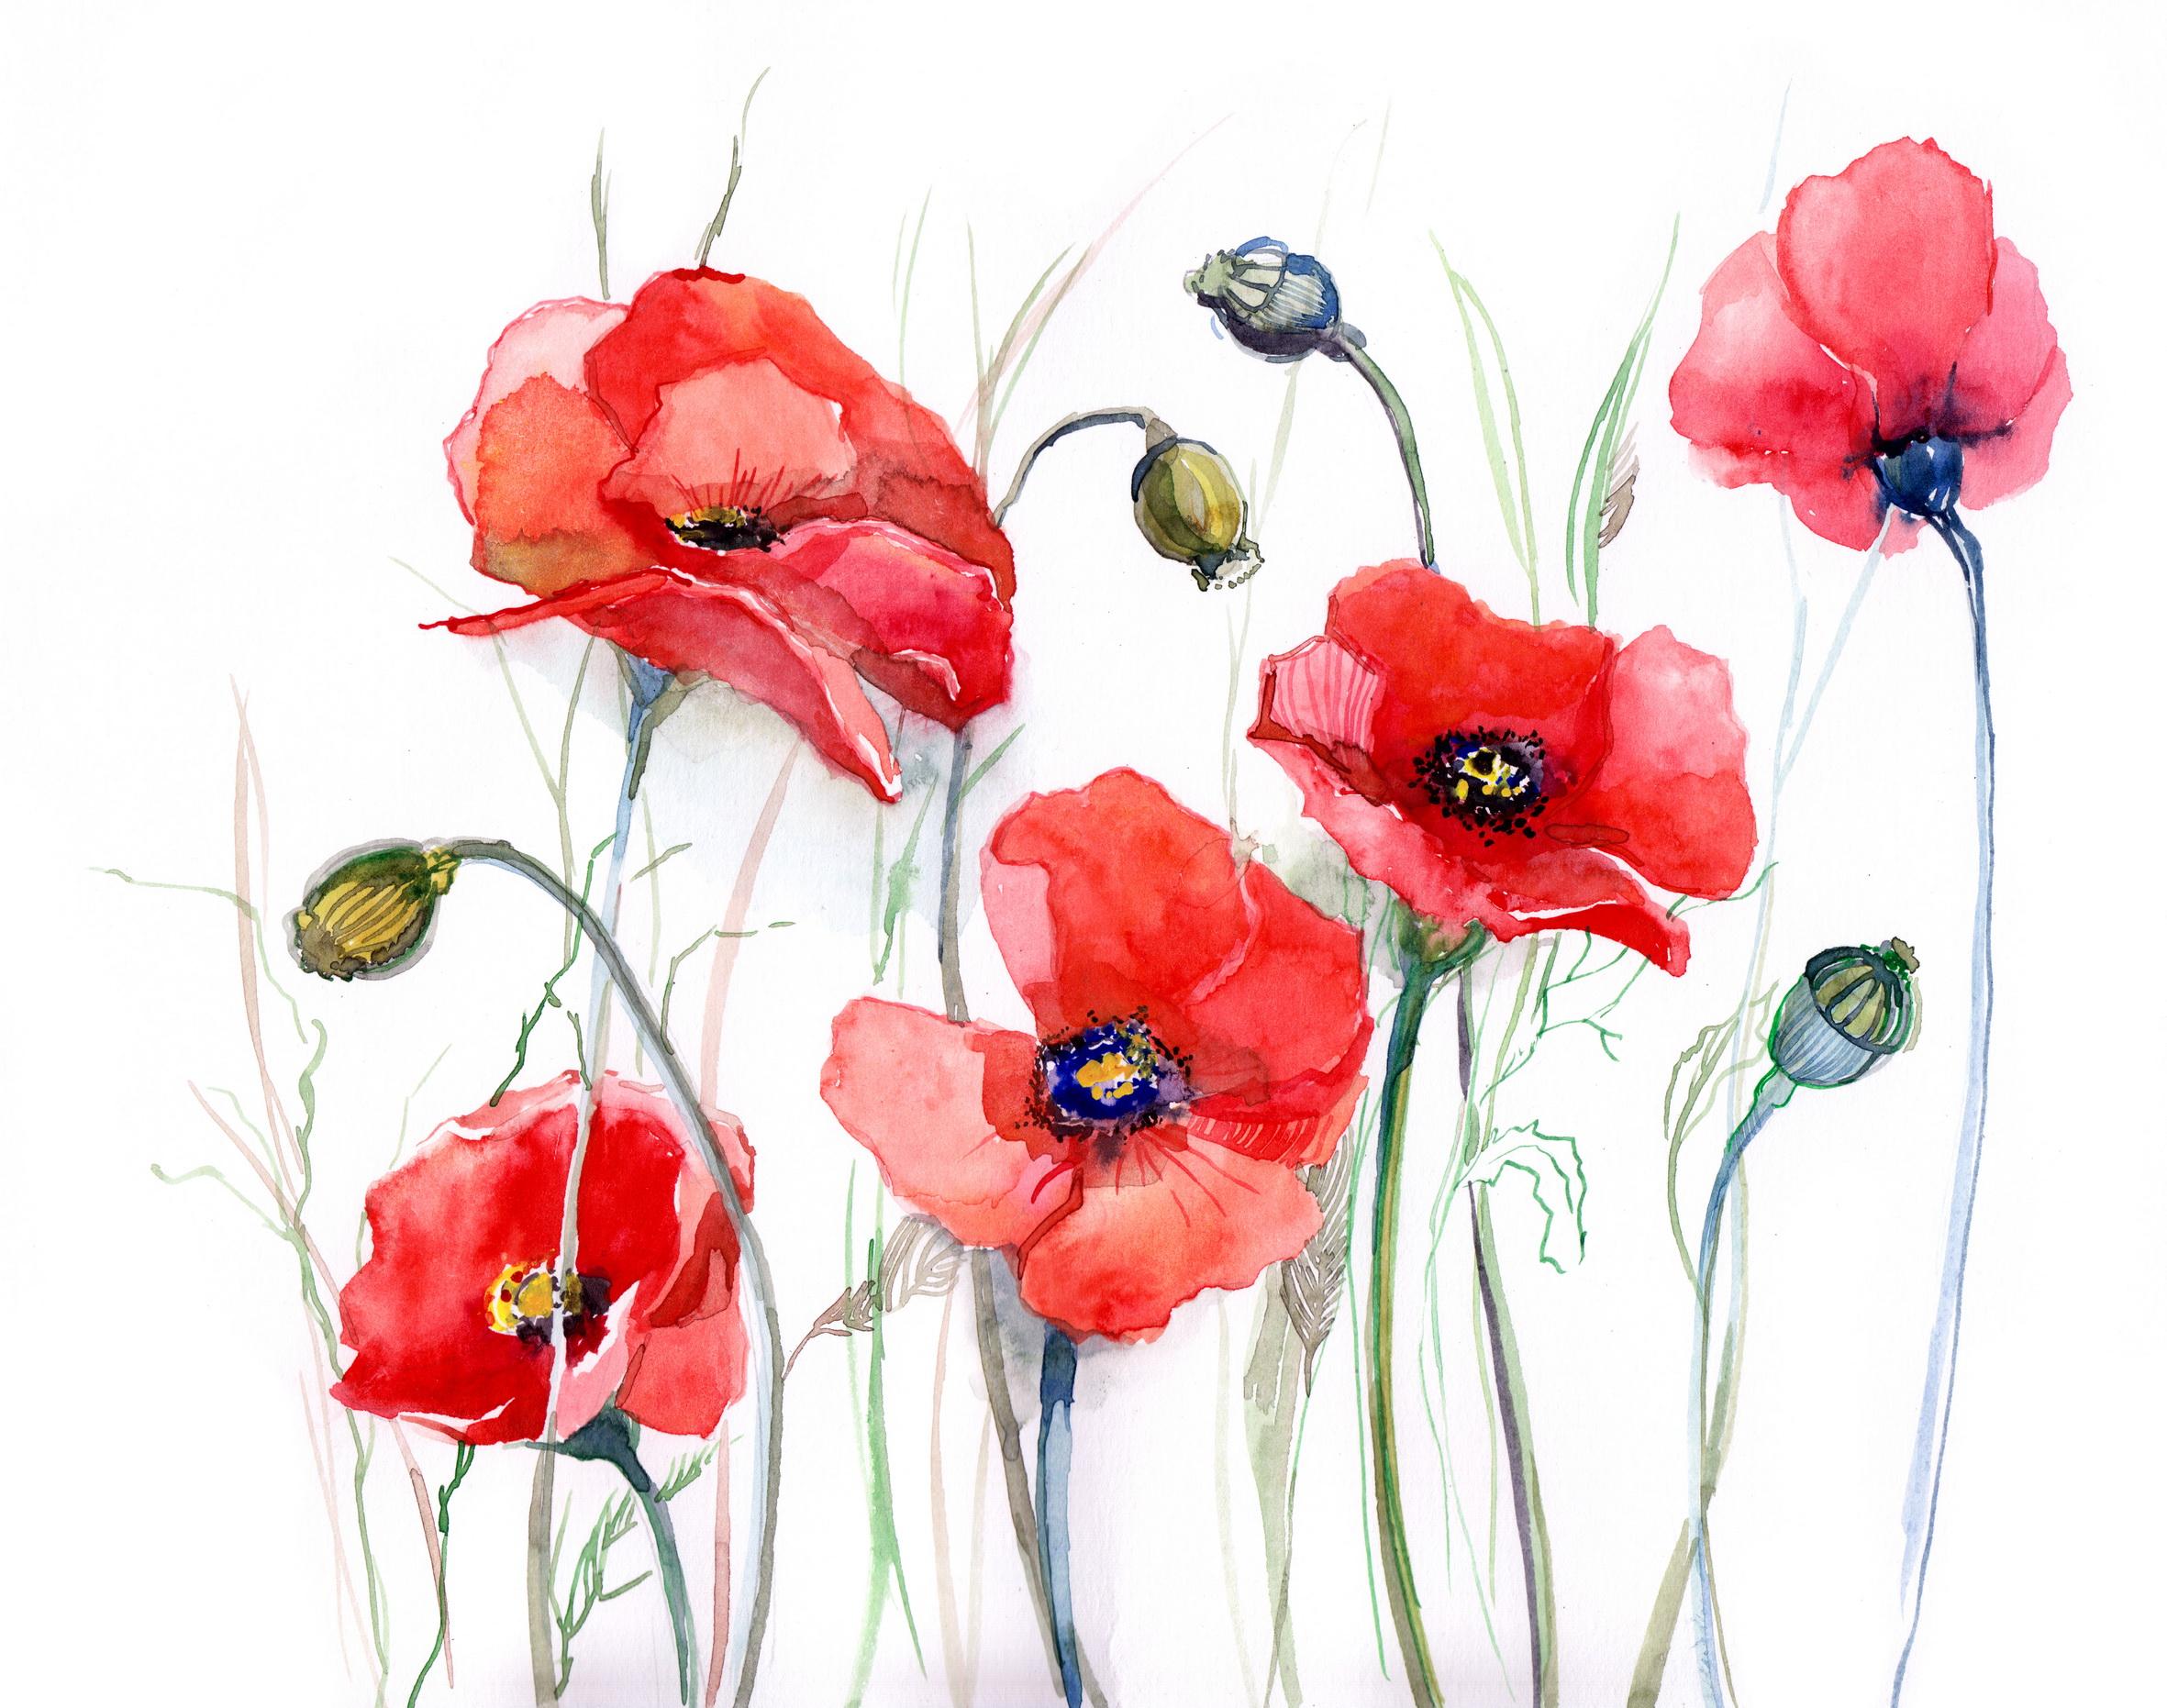 Free Images Flowering Plant Watercolor Paint Coquelicot Petal